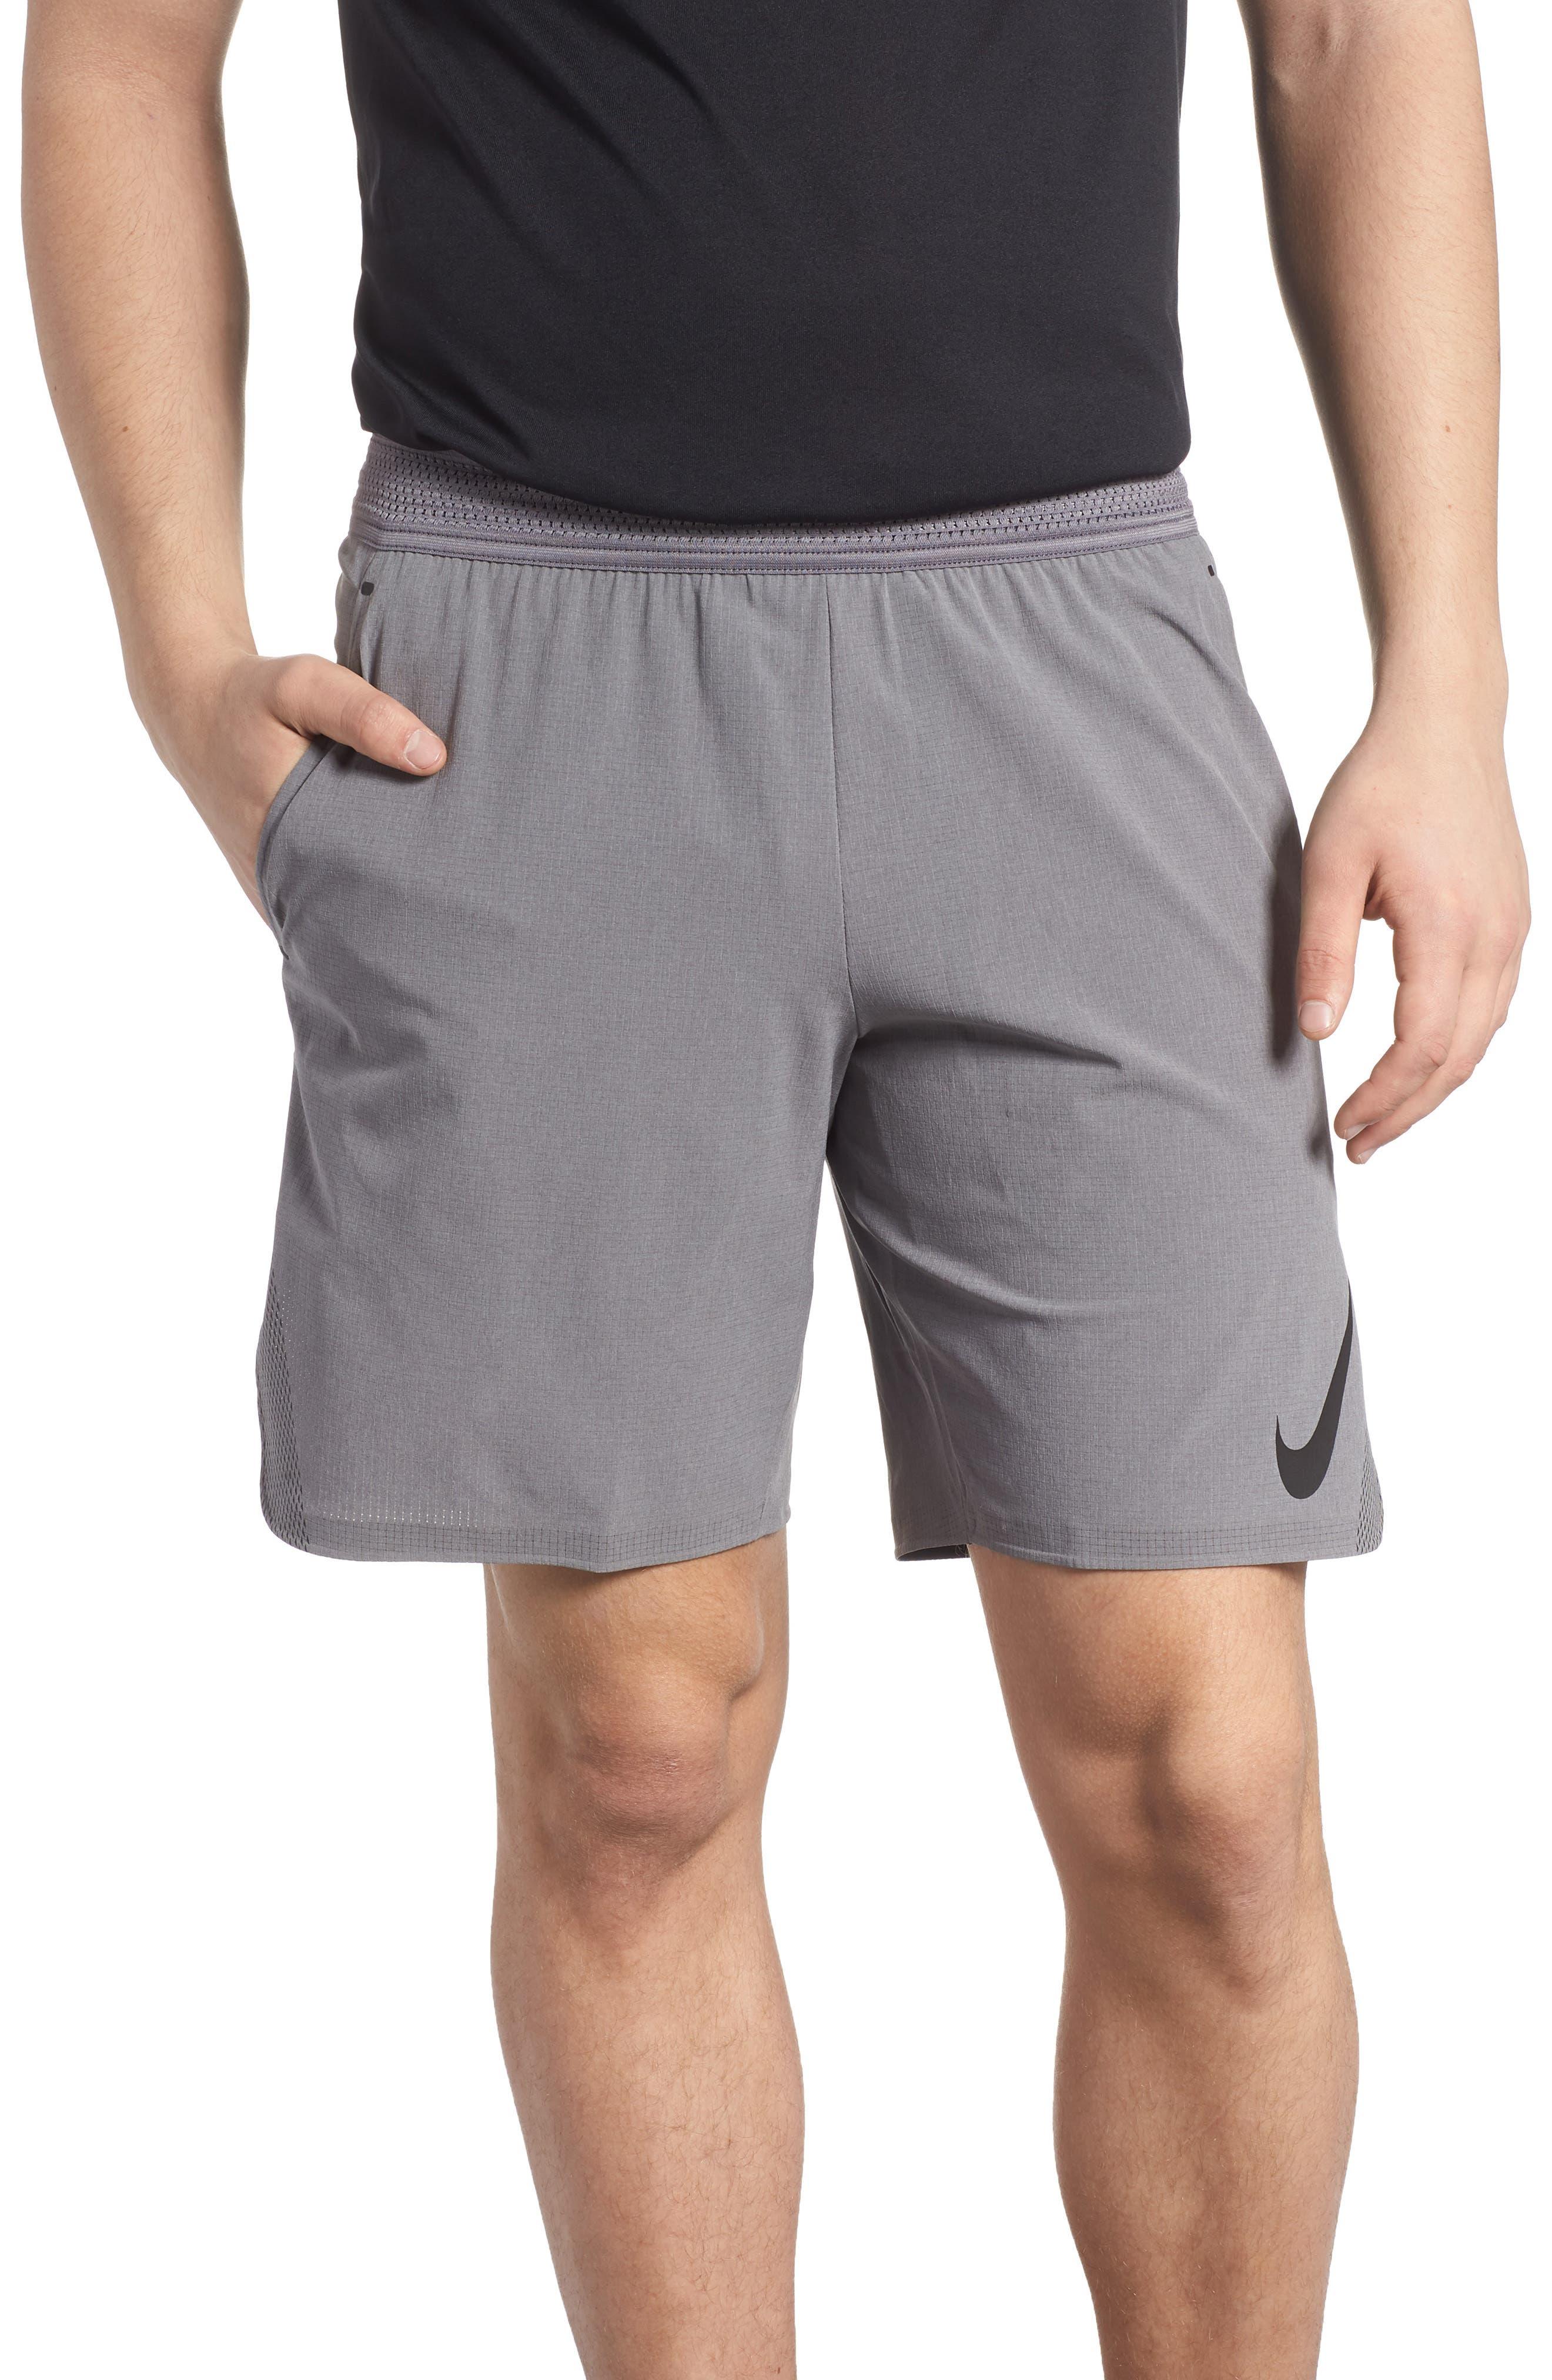 Repel 3.0 Flex Training Shorts,                             Main thumbnail 1, color,                             Gun Smoke/ Grey/ Black